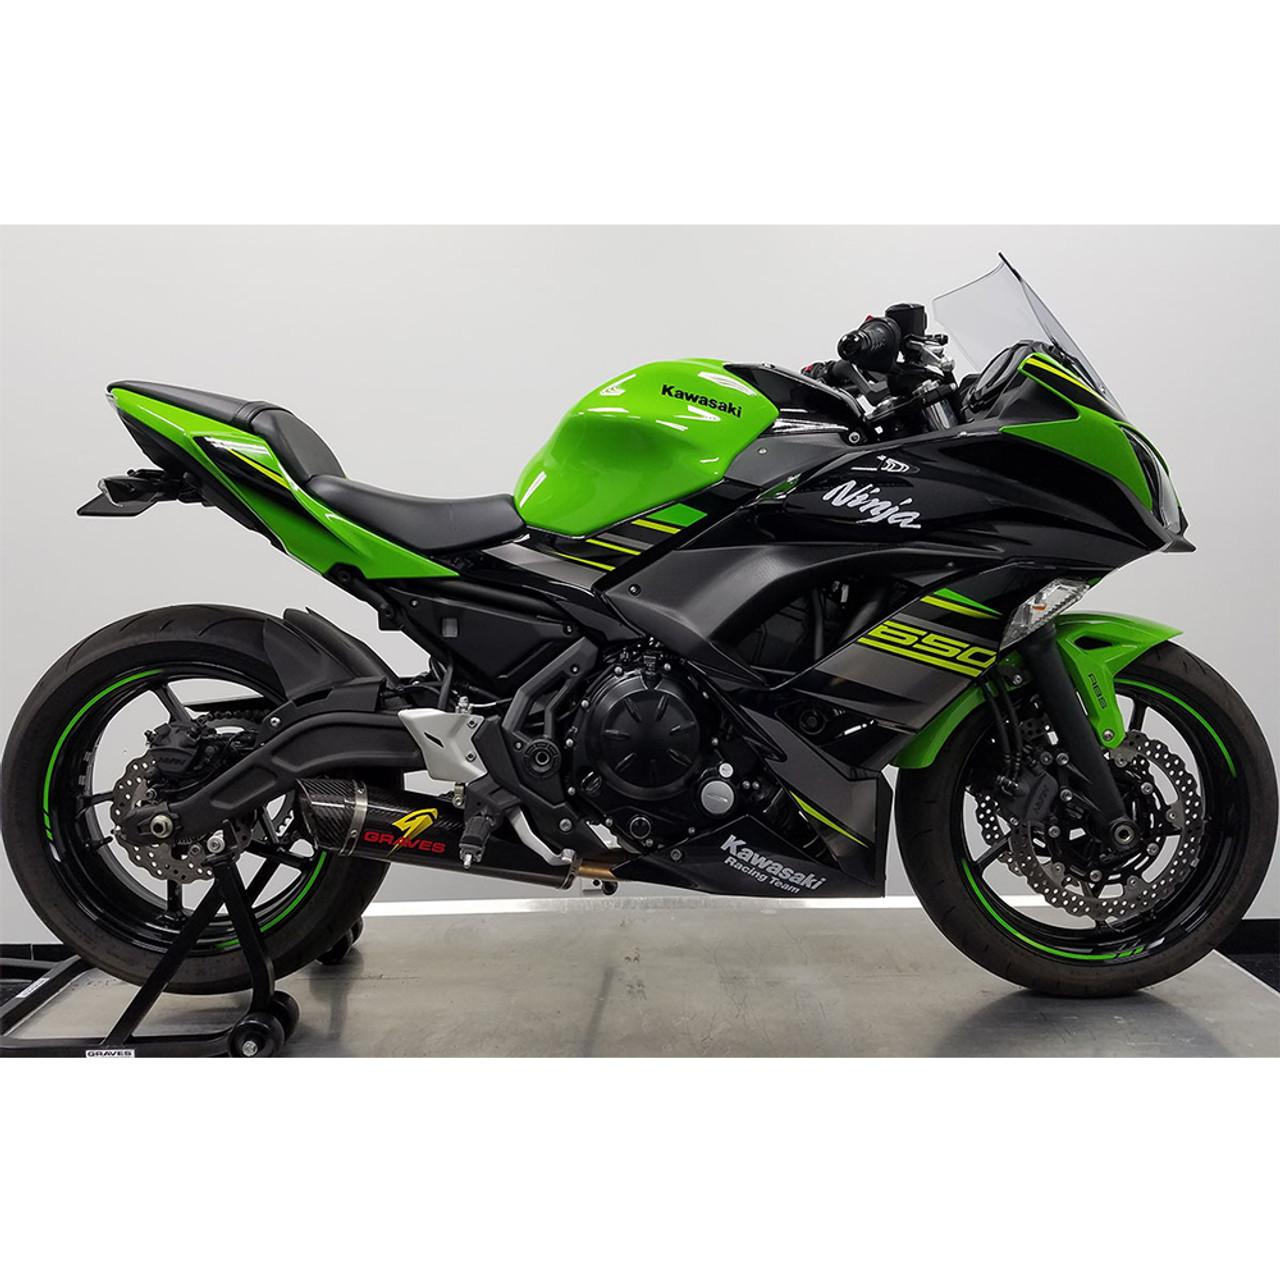 graves motorsports kawasaki ninja 650 17 21 full exhaust system